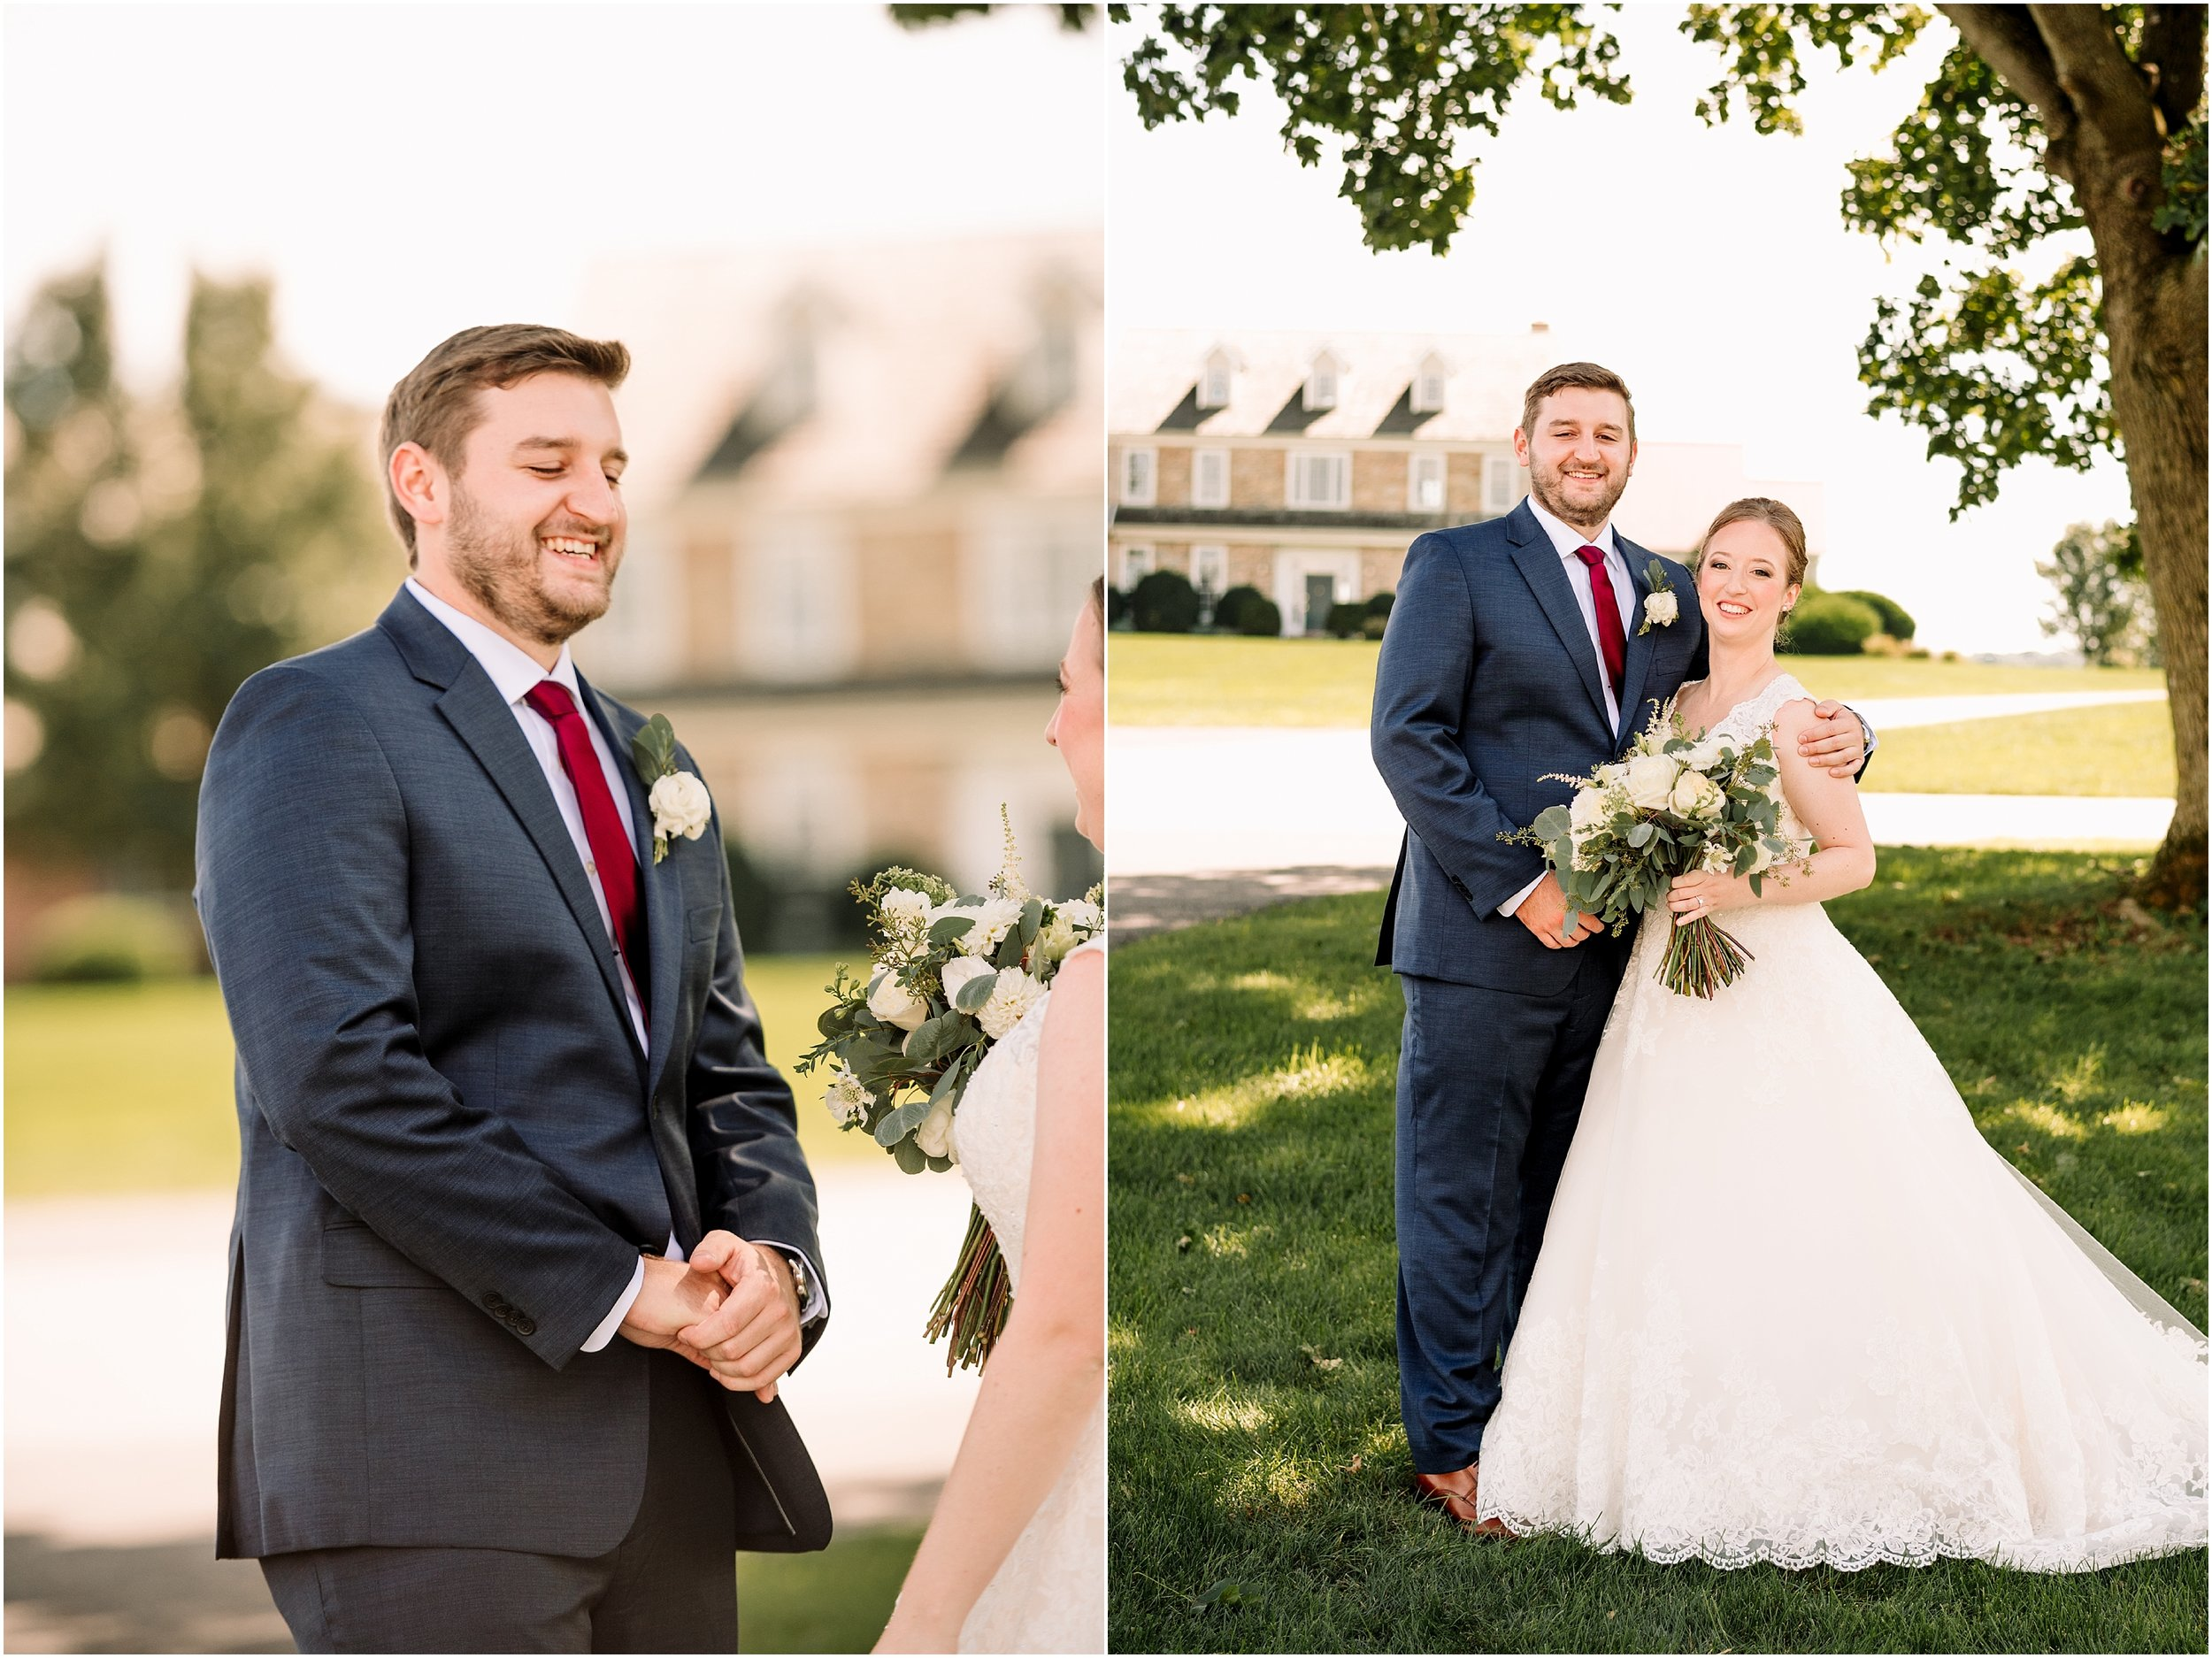 hannah leigh photography Wyndridge Farm Wedding York PA_1482.jpg